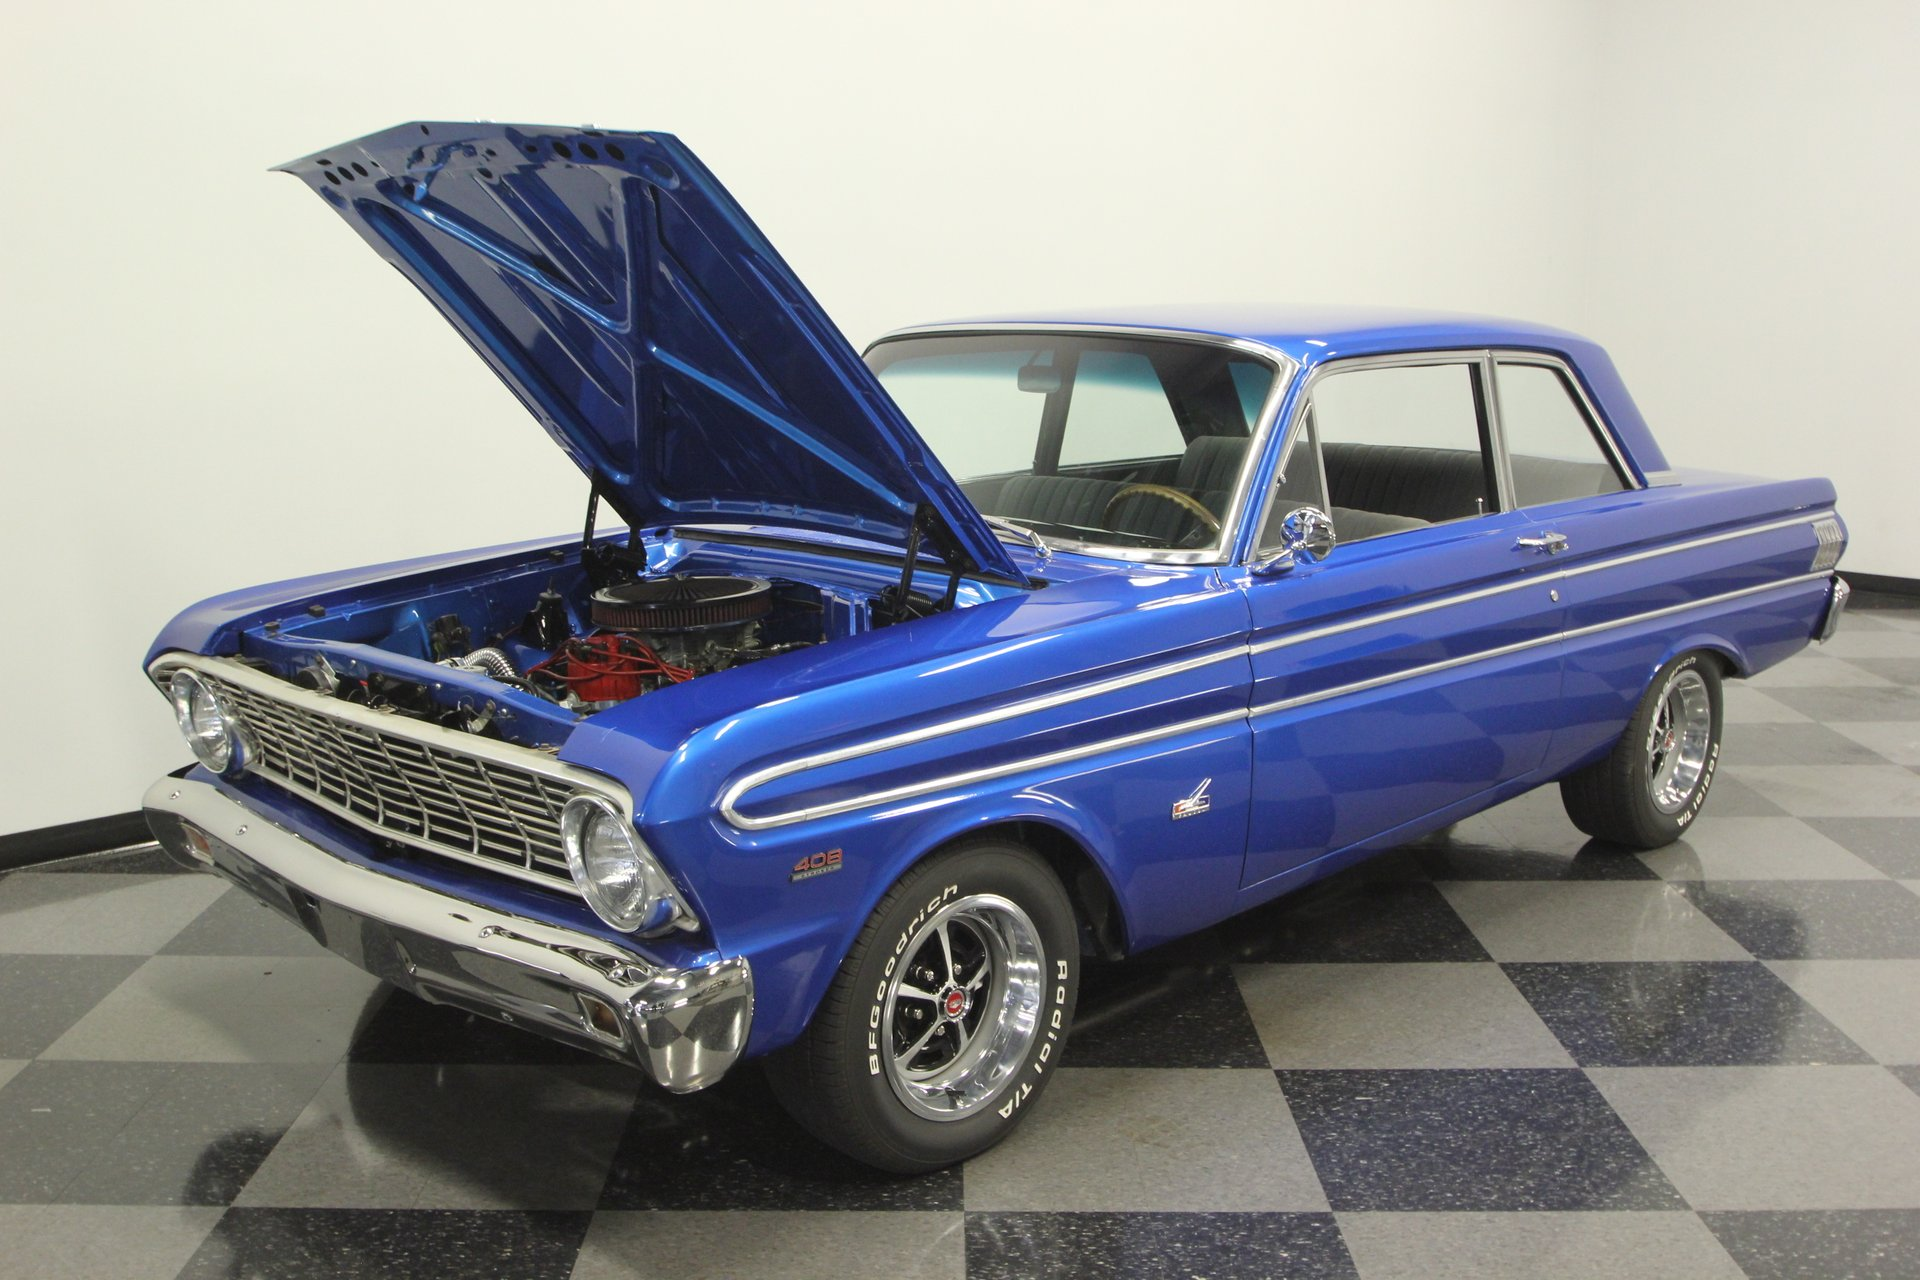 1964 Ford Falcon | Streetside Classics - The Nation's